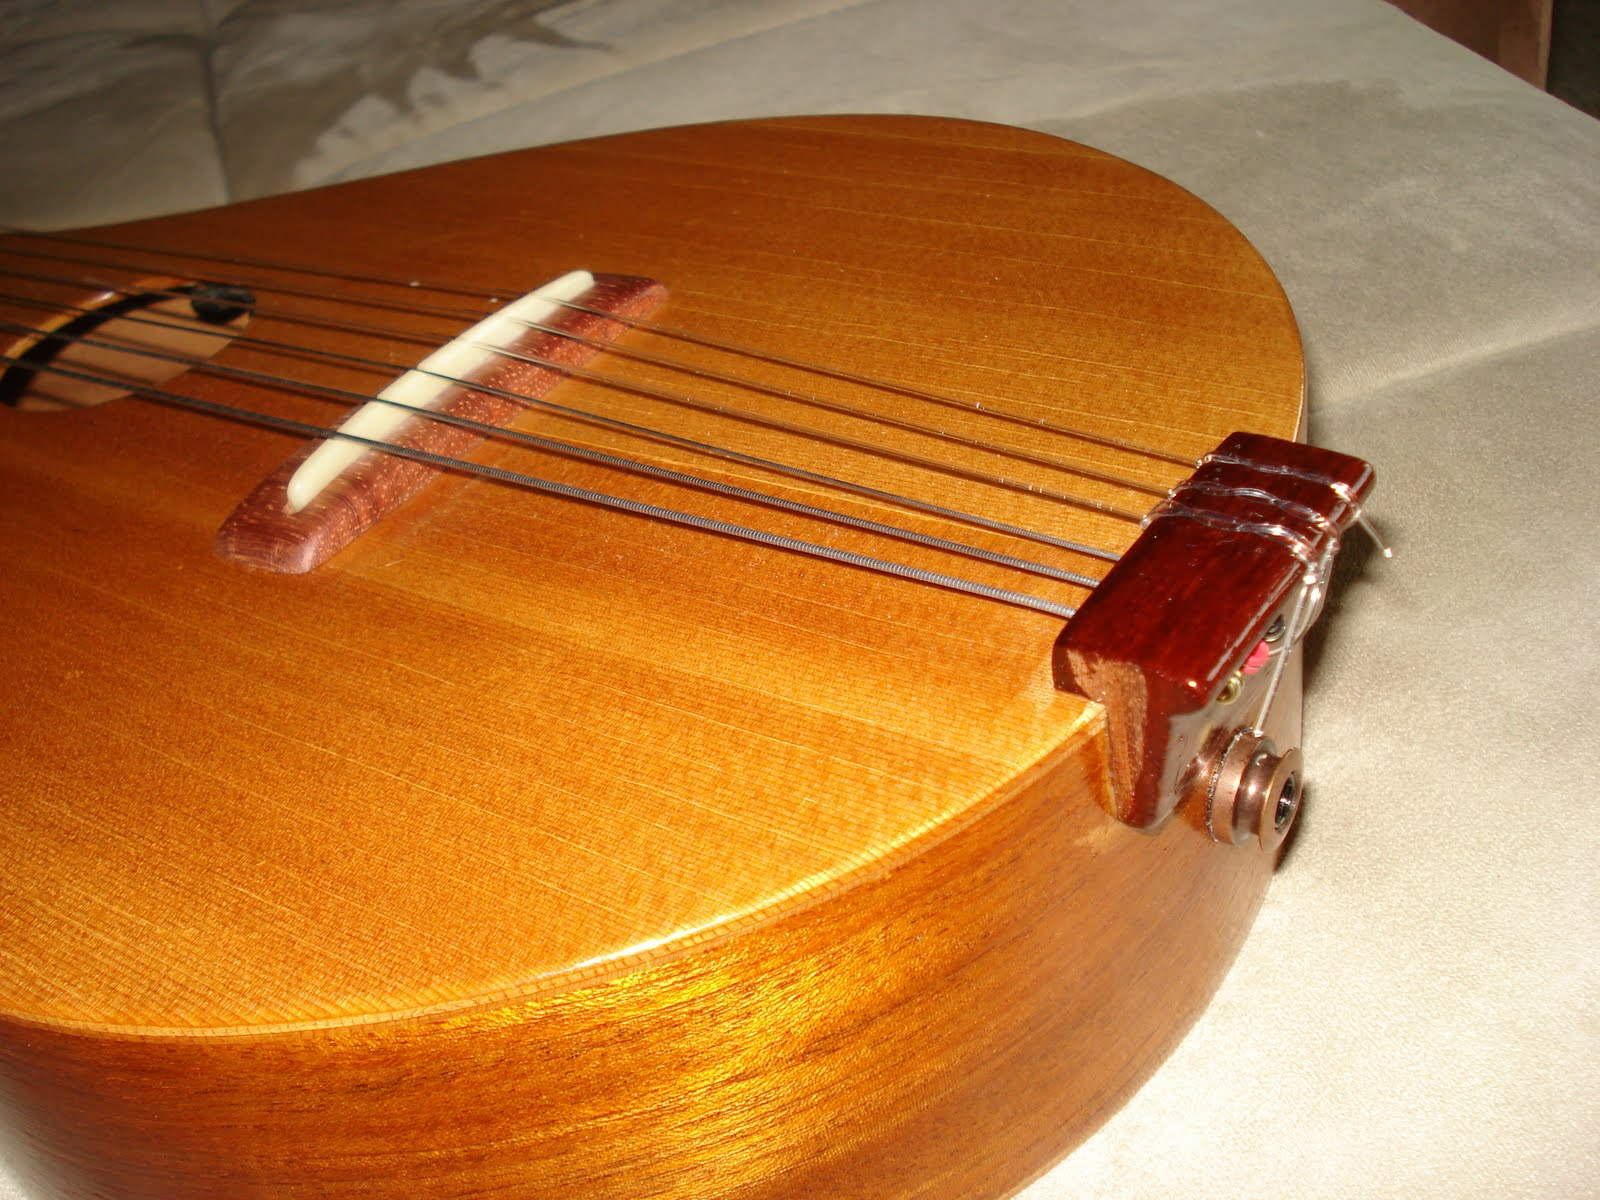 Feb 2010 nylon strings i